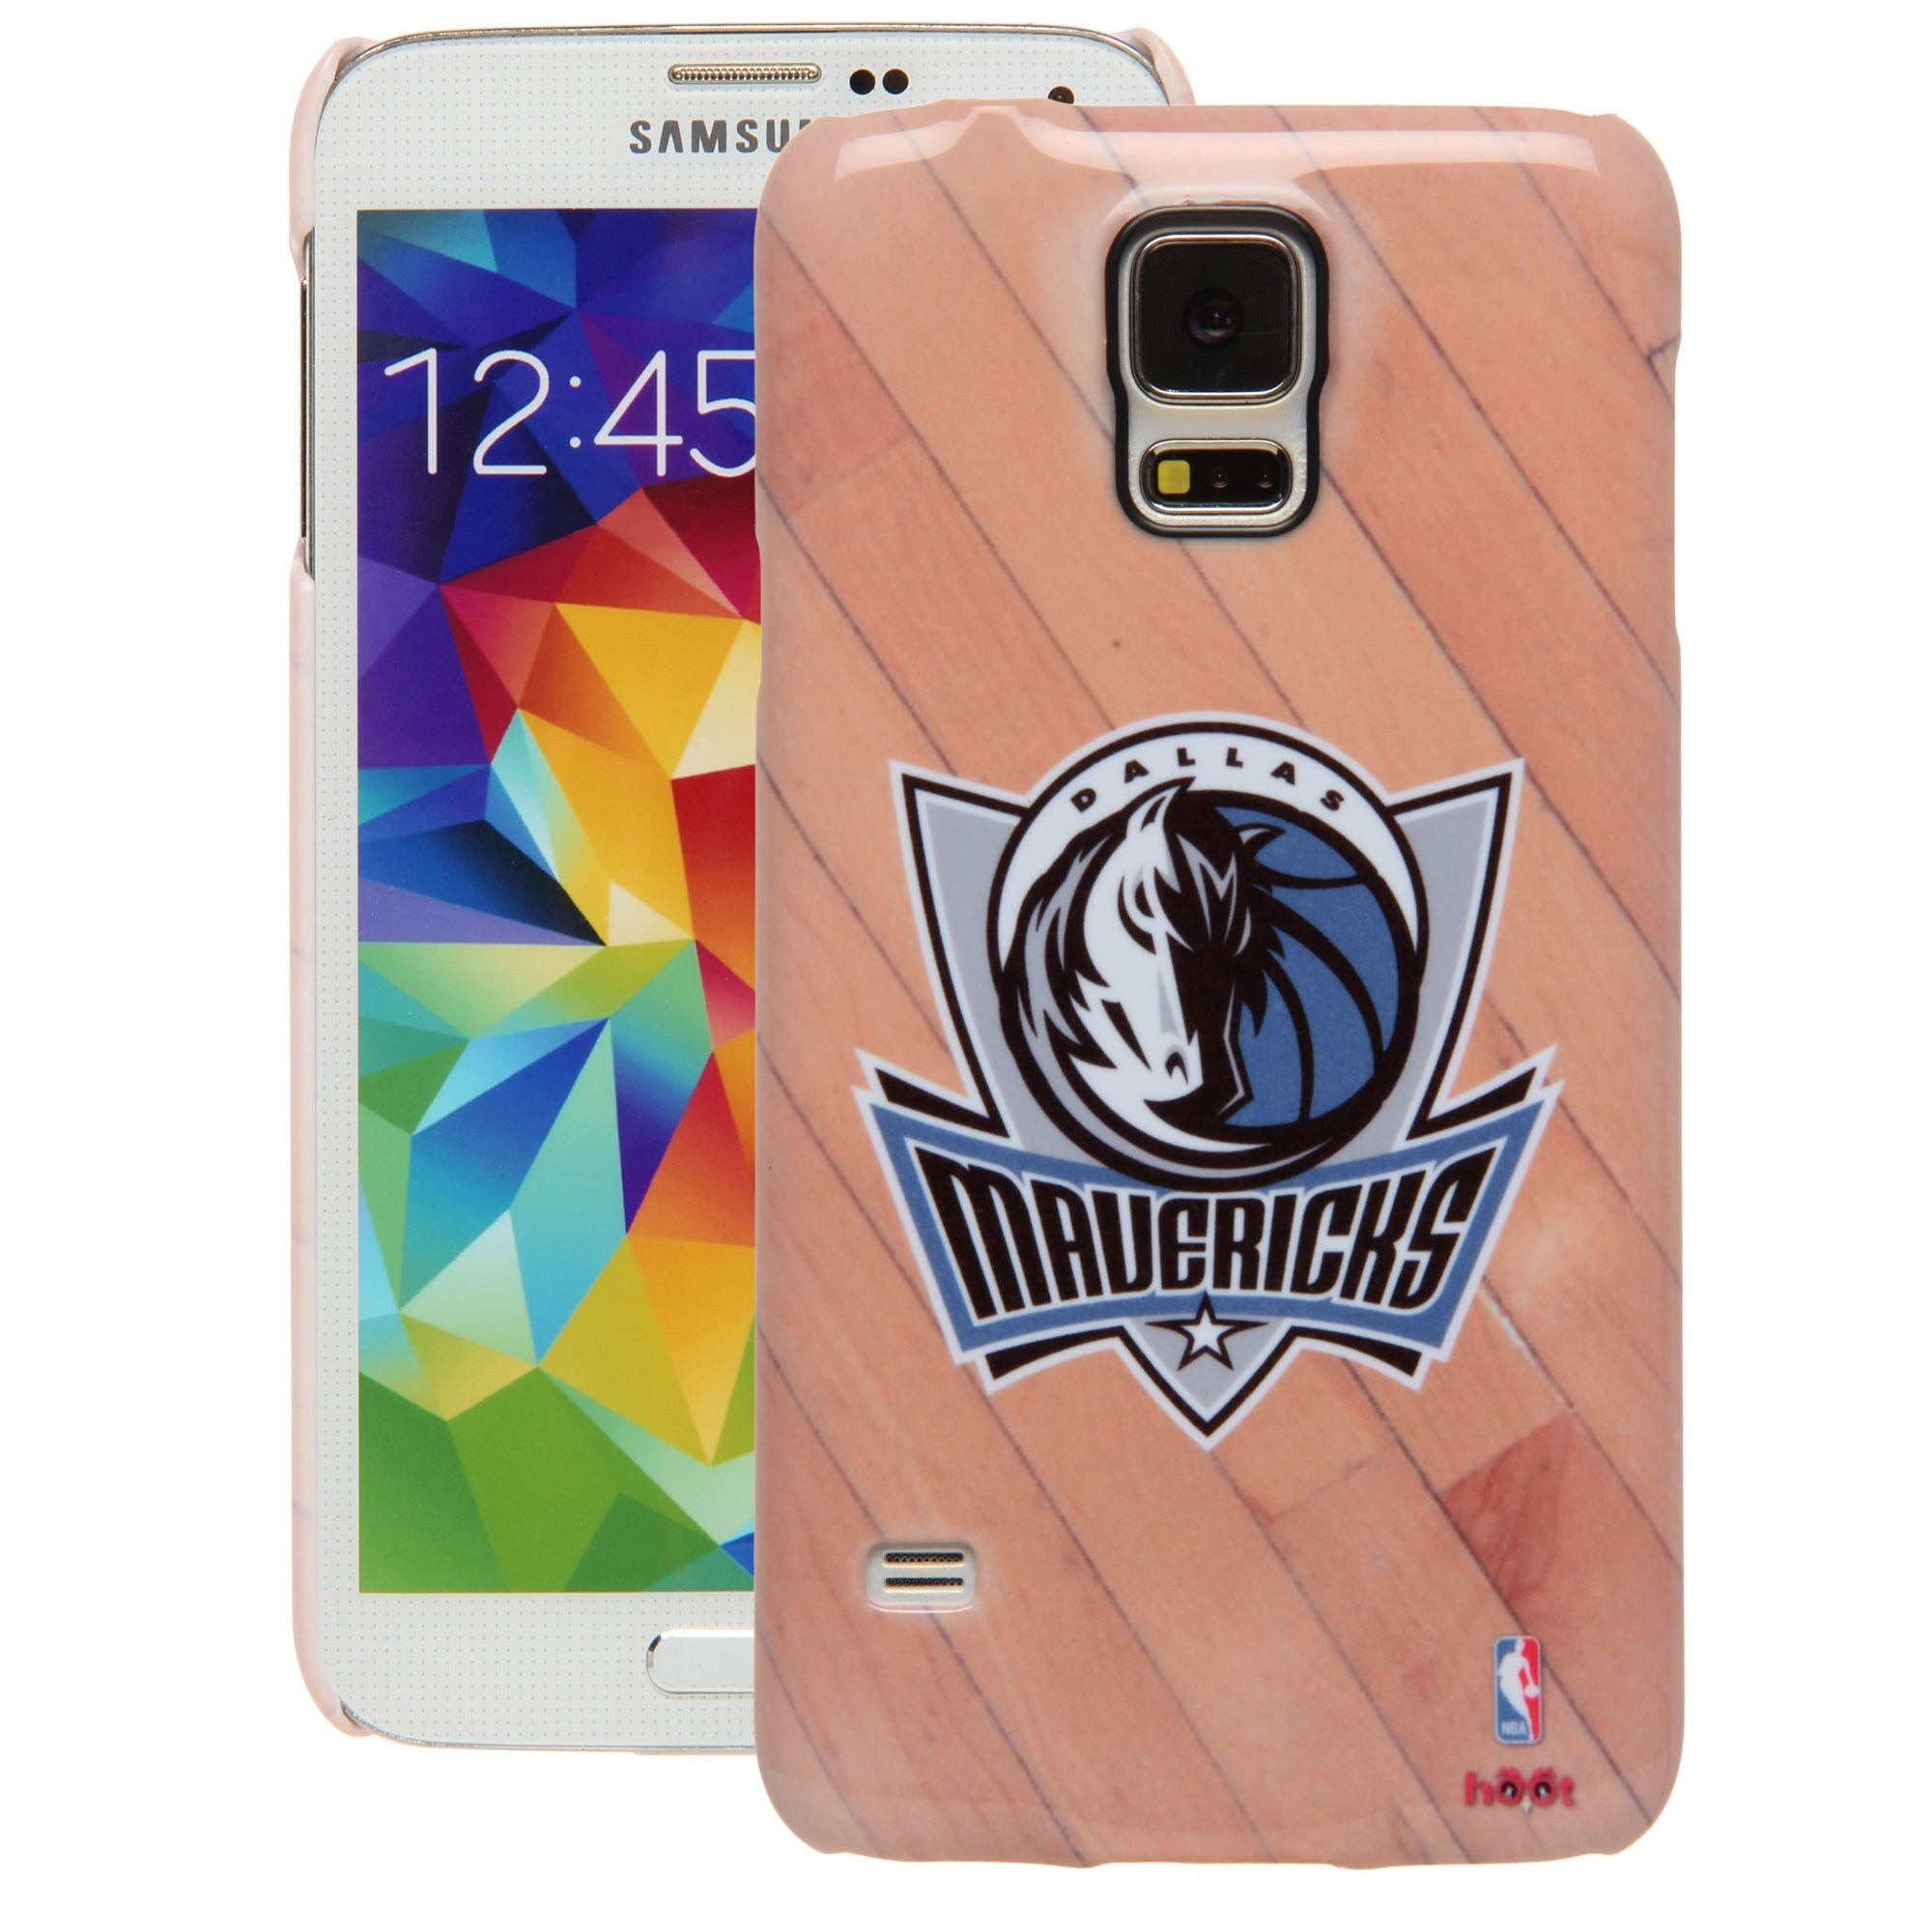 Dallas Mavericks Galaxy S5 Hardwood Court Case